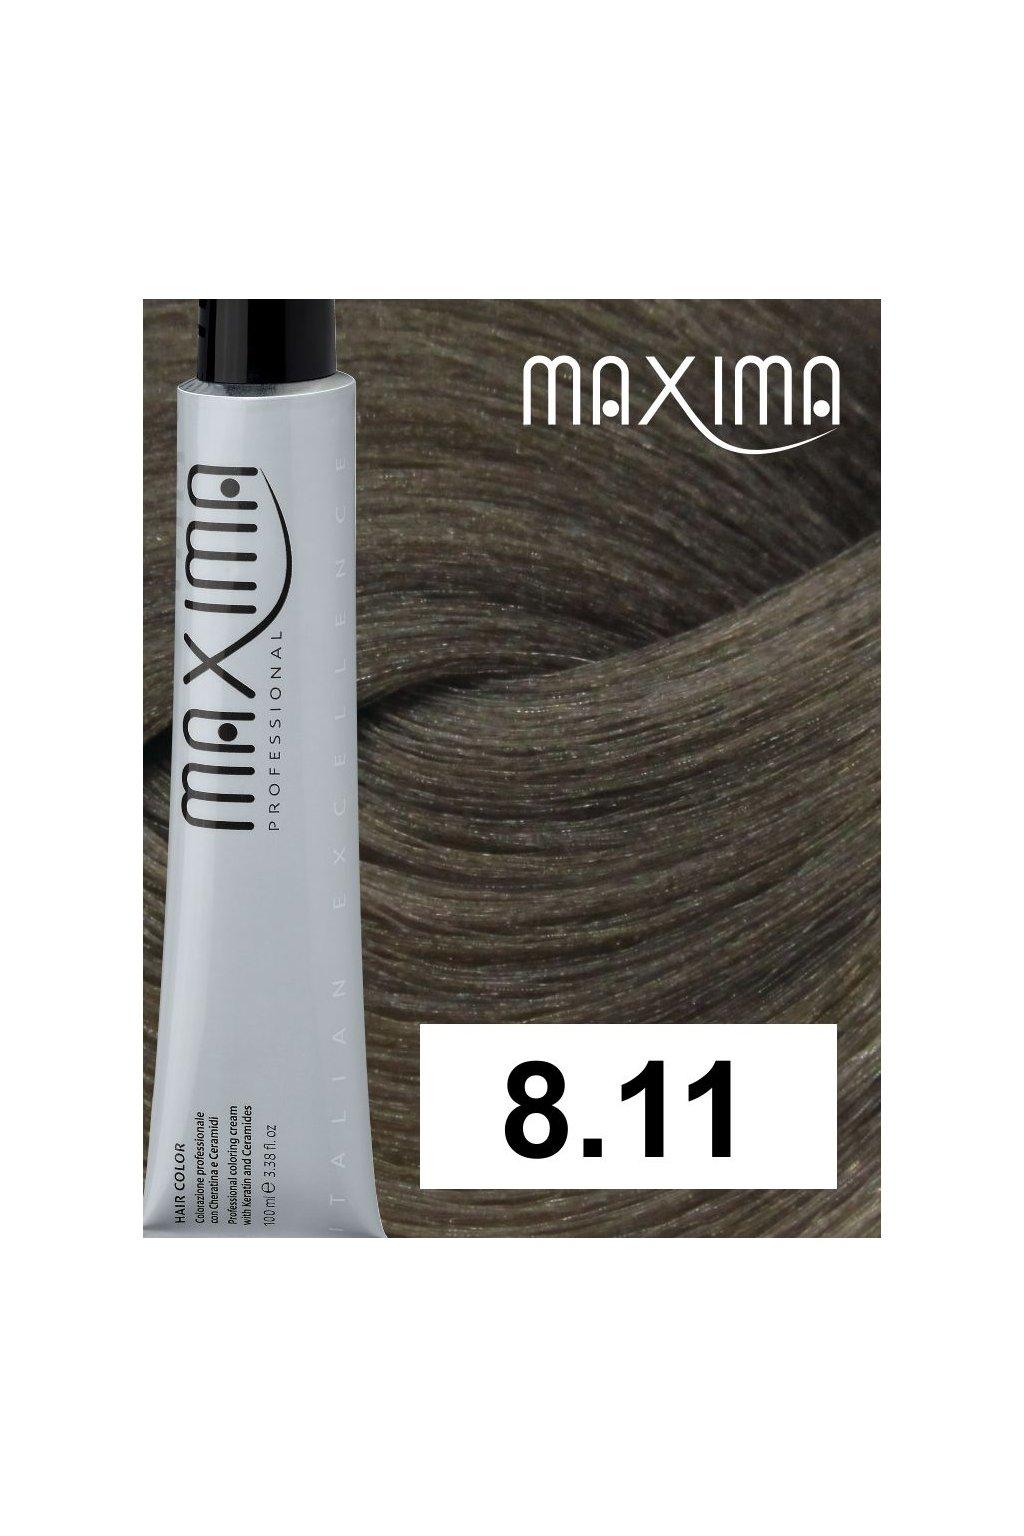 8 11 max